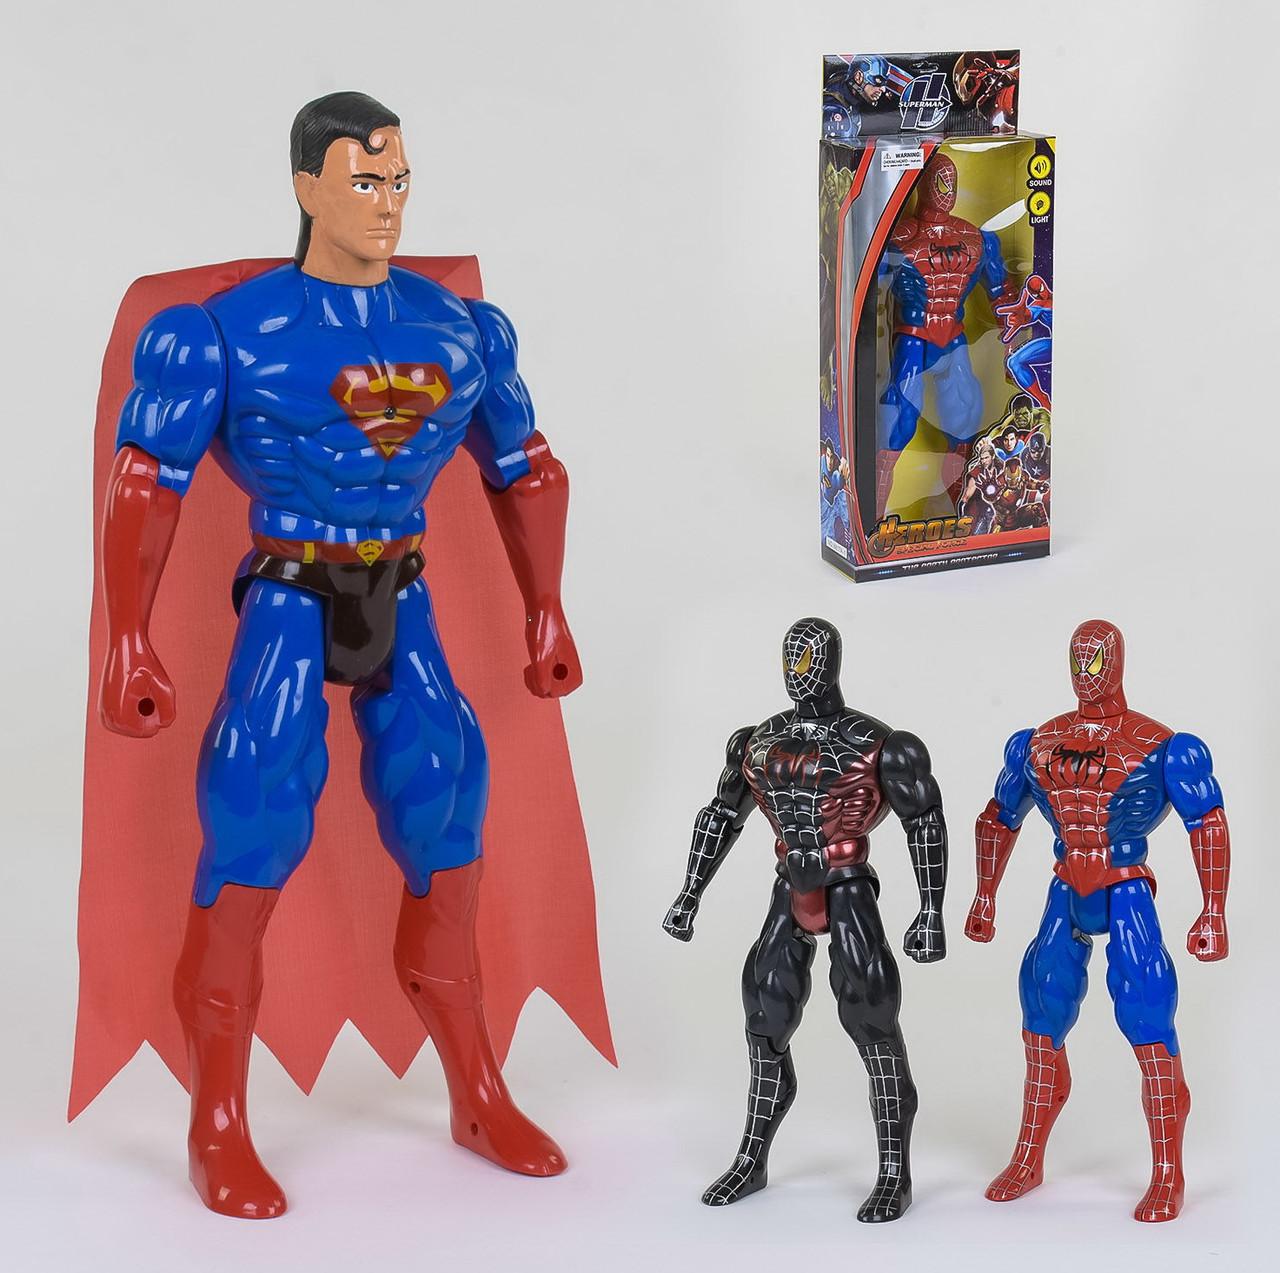 Фигурка супер - героя человек Marvel SuperMan